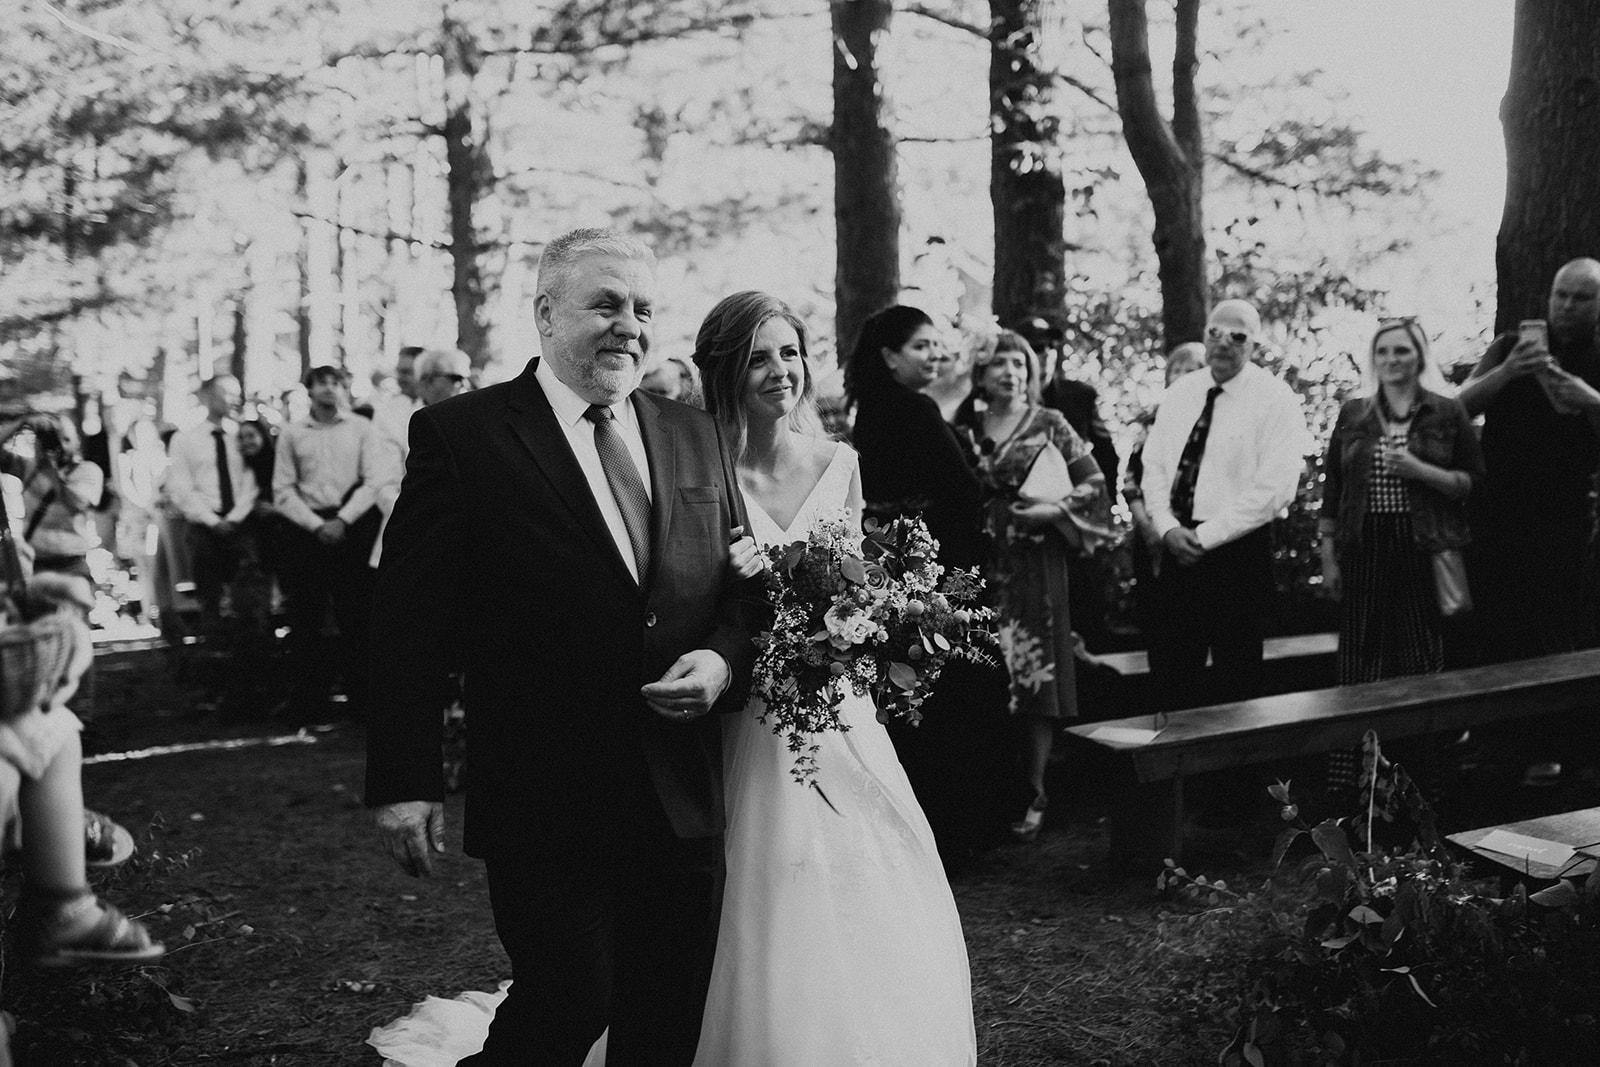 camp_wokanda_peoria_illinois_wedding_photographer_wright_photographs_bliese_0205.jpg